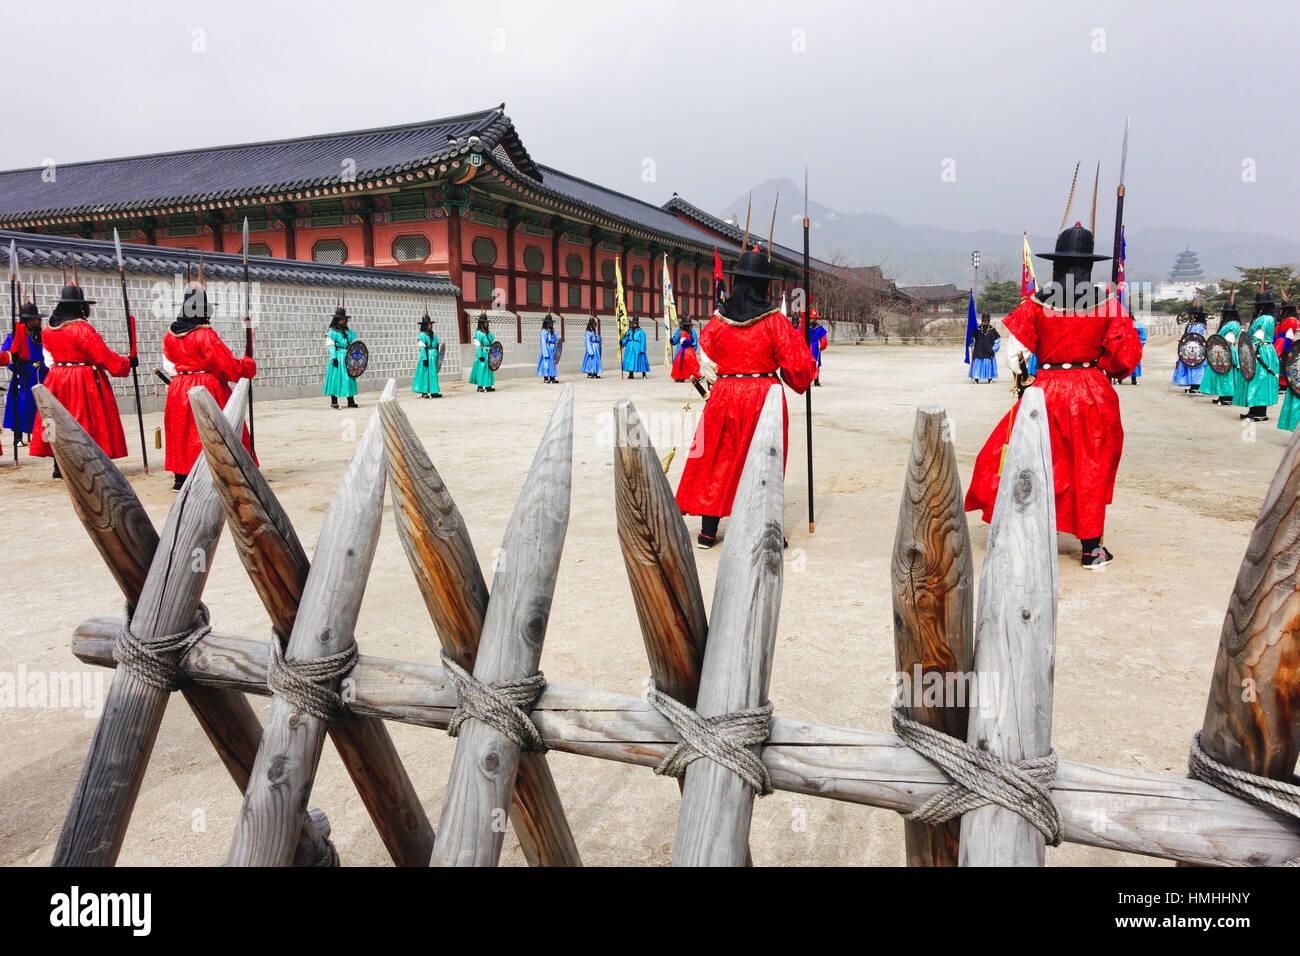 Königliche Garde Inspektion Zeremonie, Gyeongbokgung-Palast, Seoul, Südkorea Stockbild